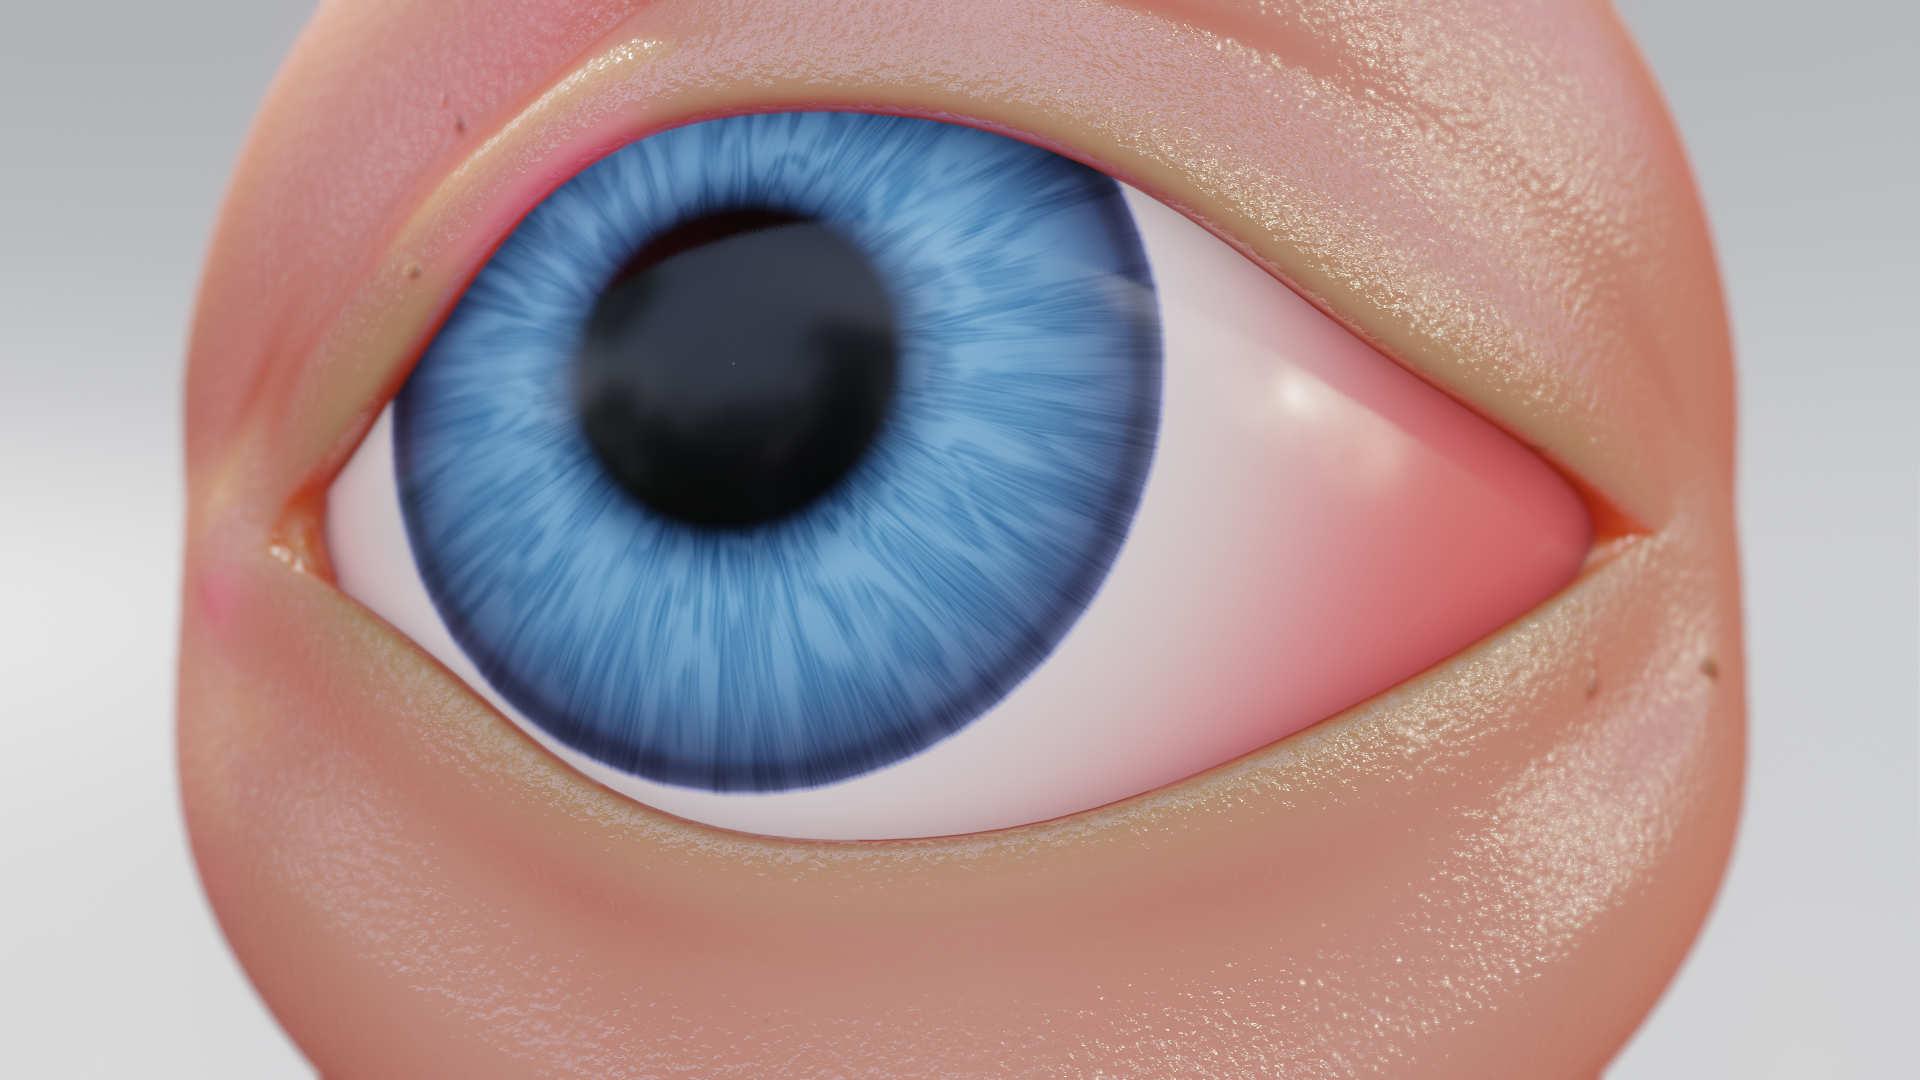 Eye_Procedural_006